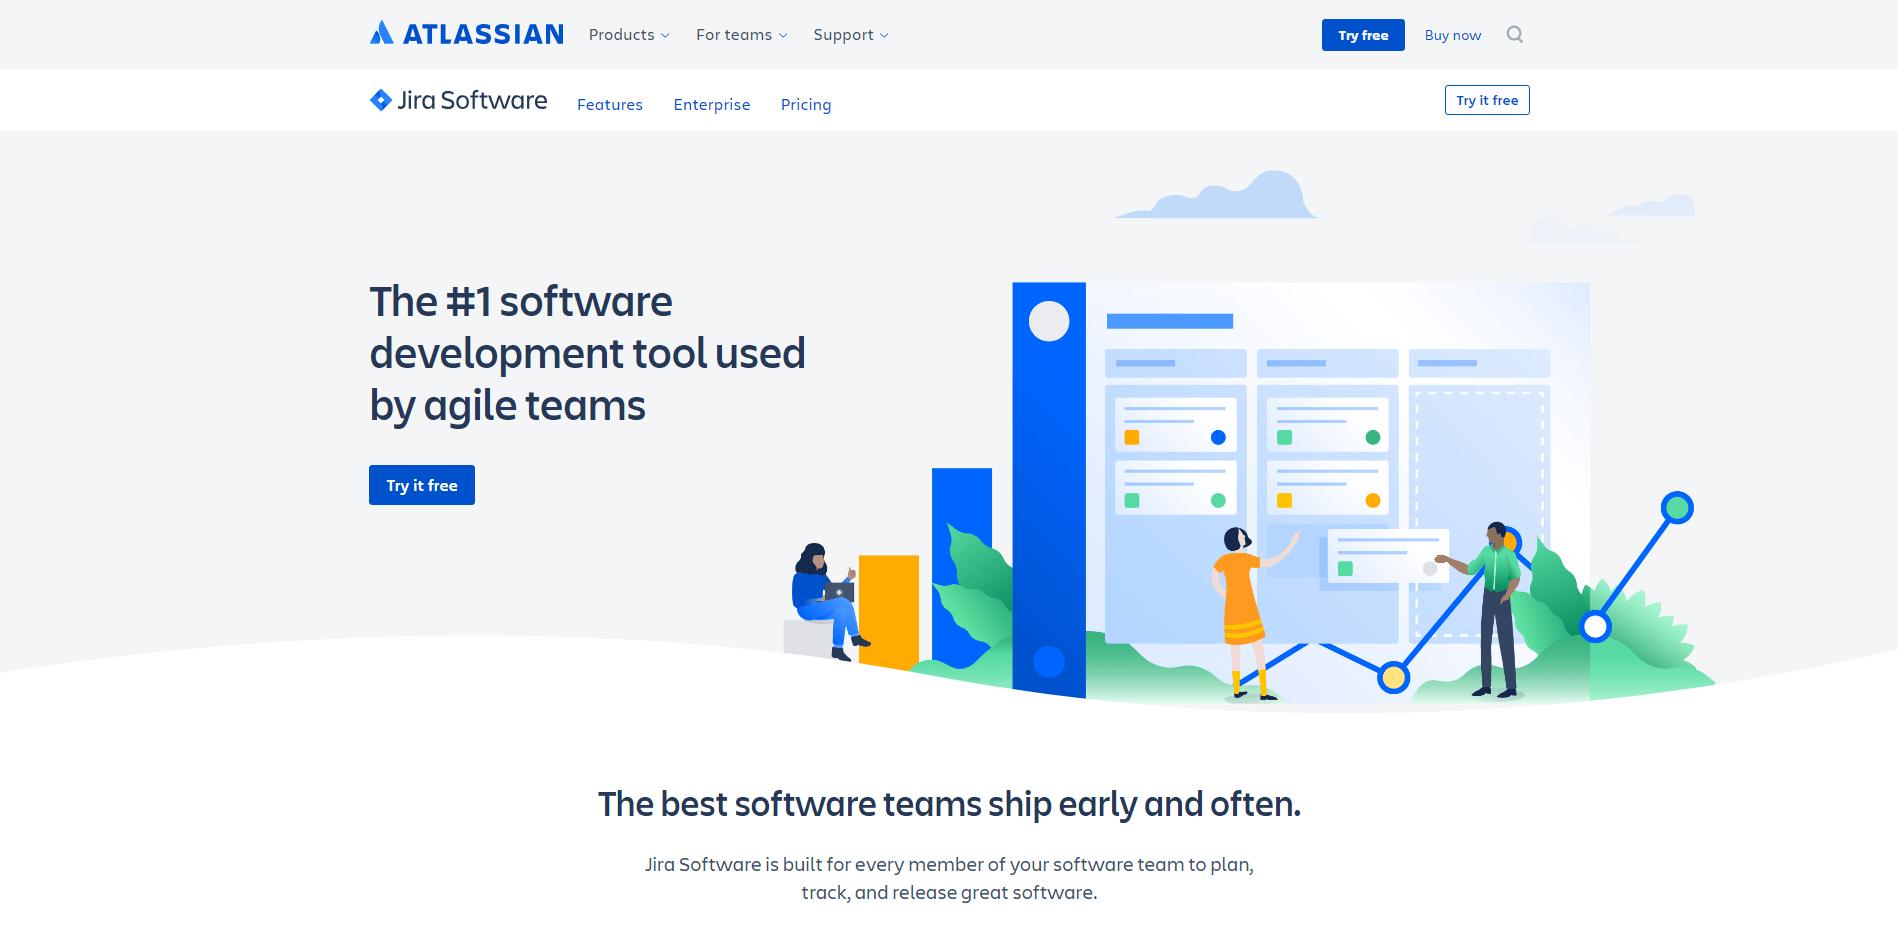 Jira-Software-by-Atlassian